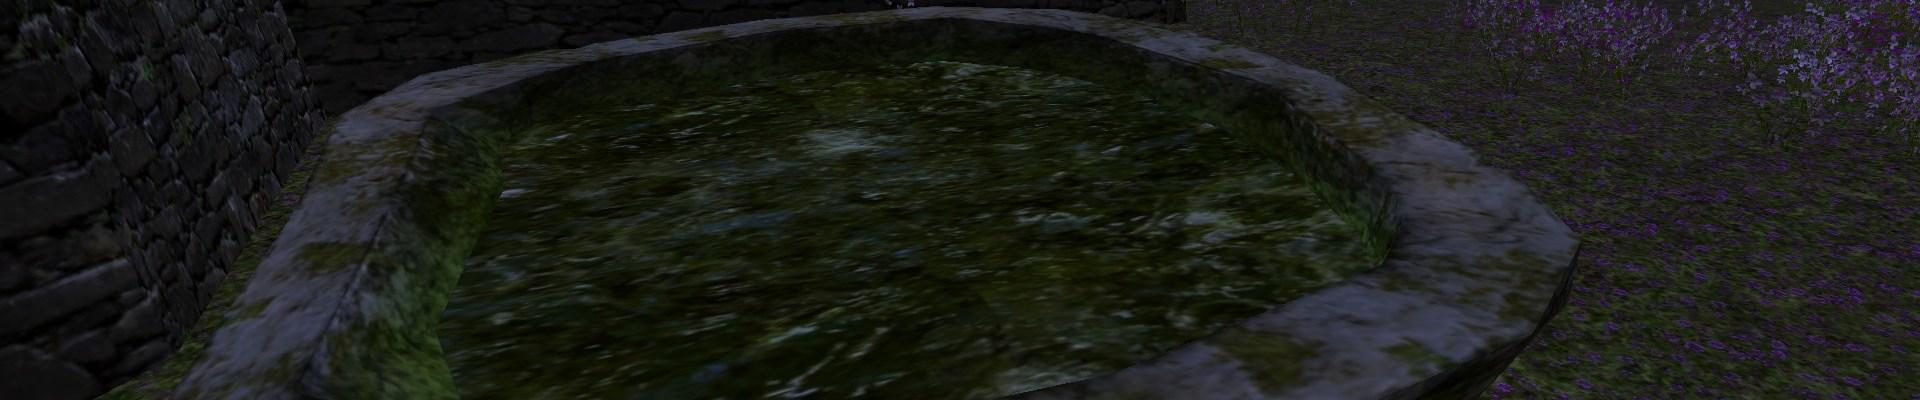 Lac Inquiétant